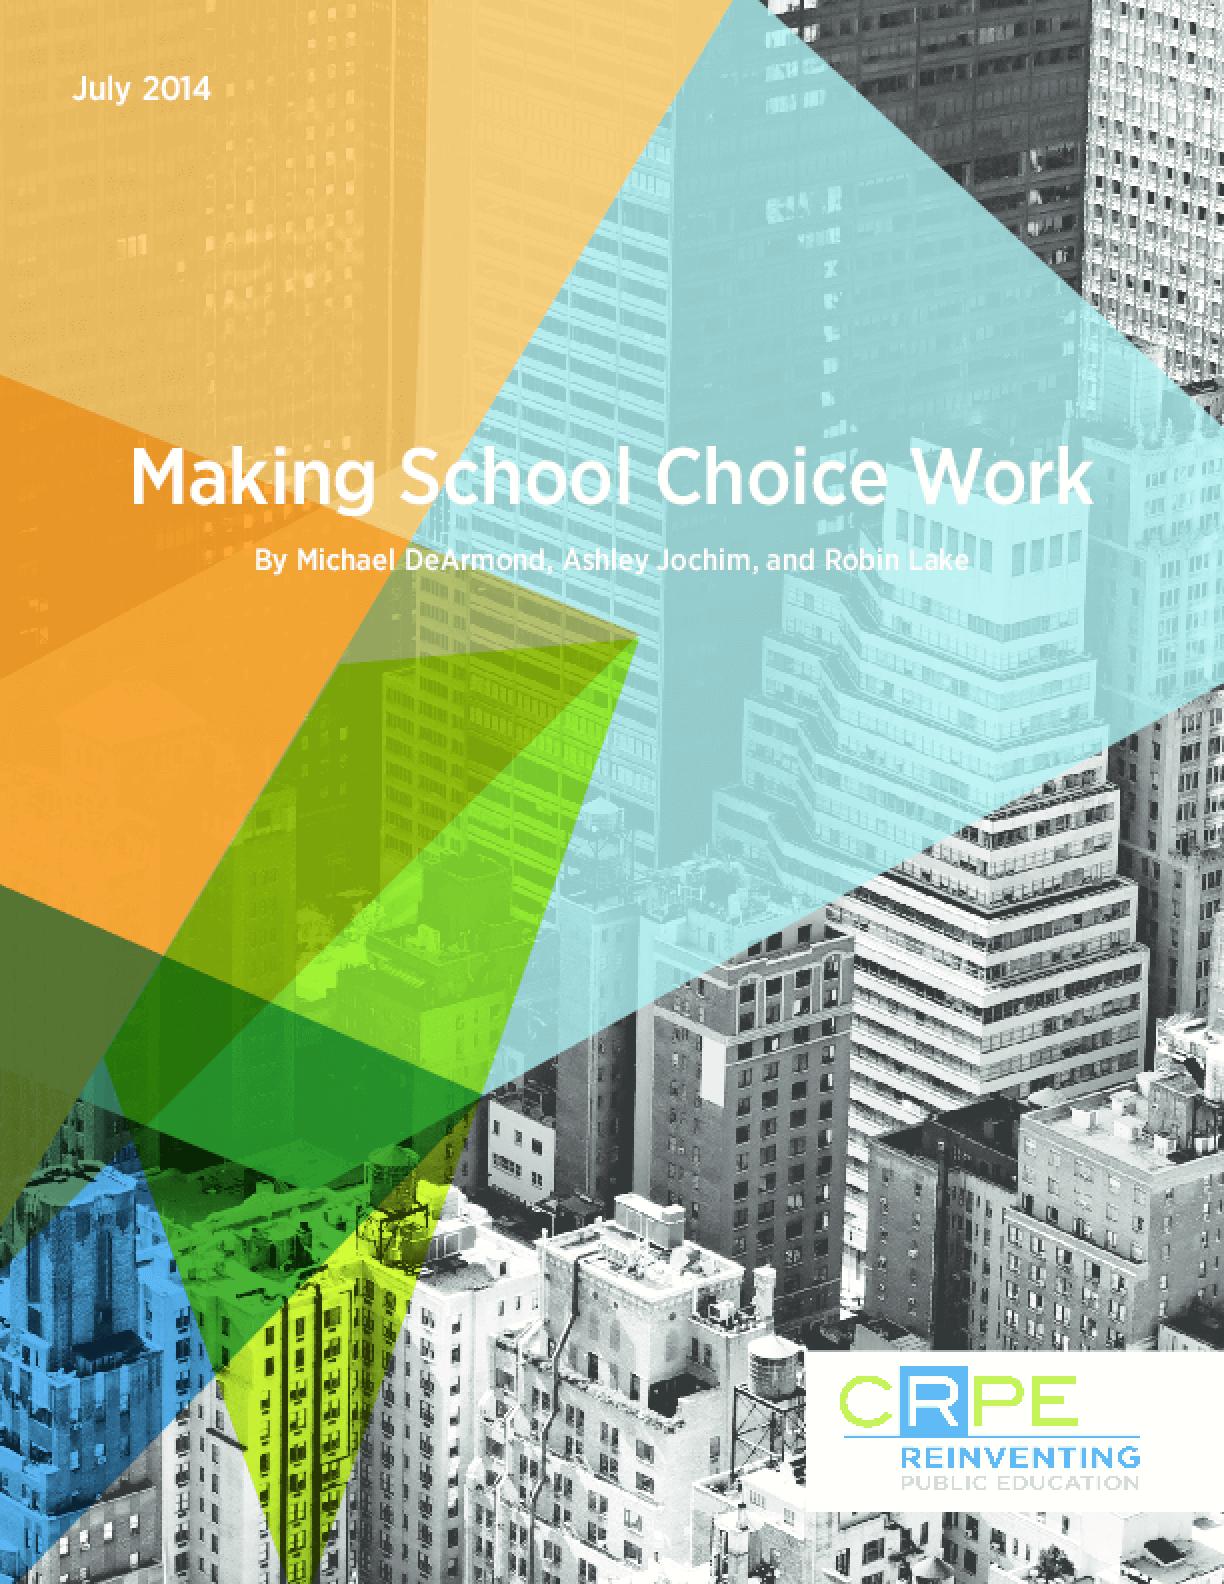 Making School Choice Work